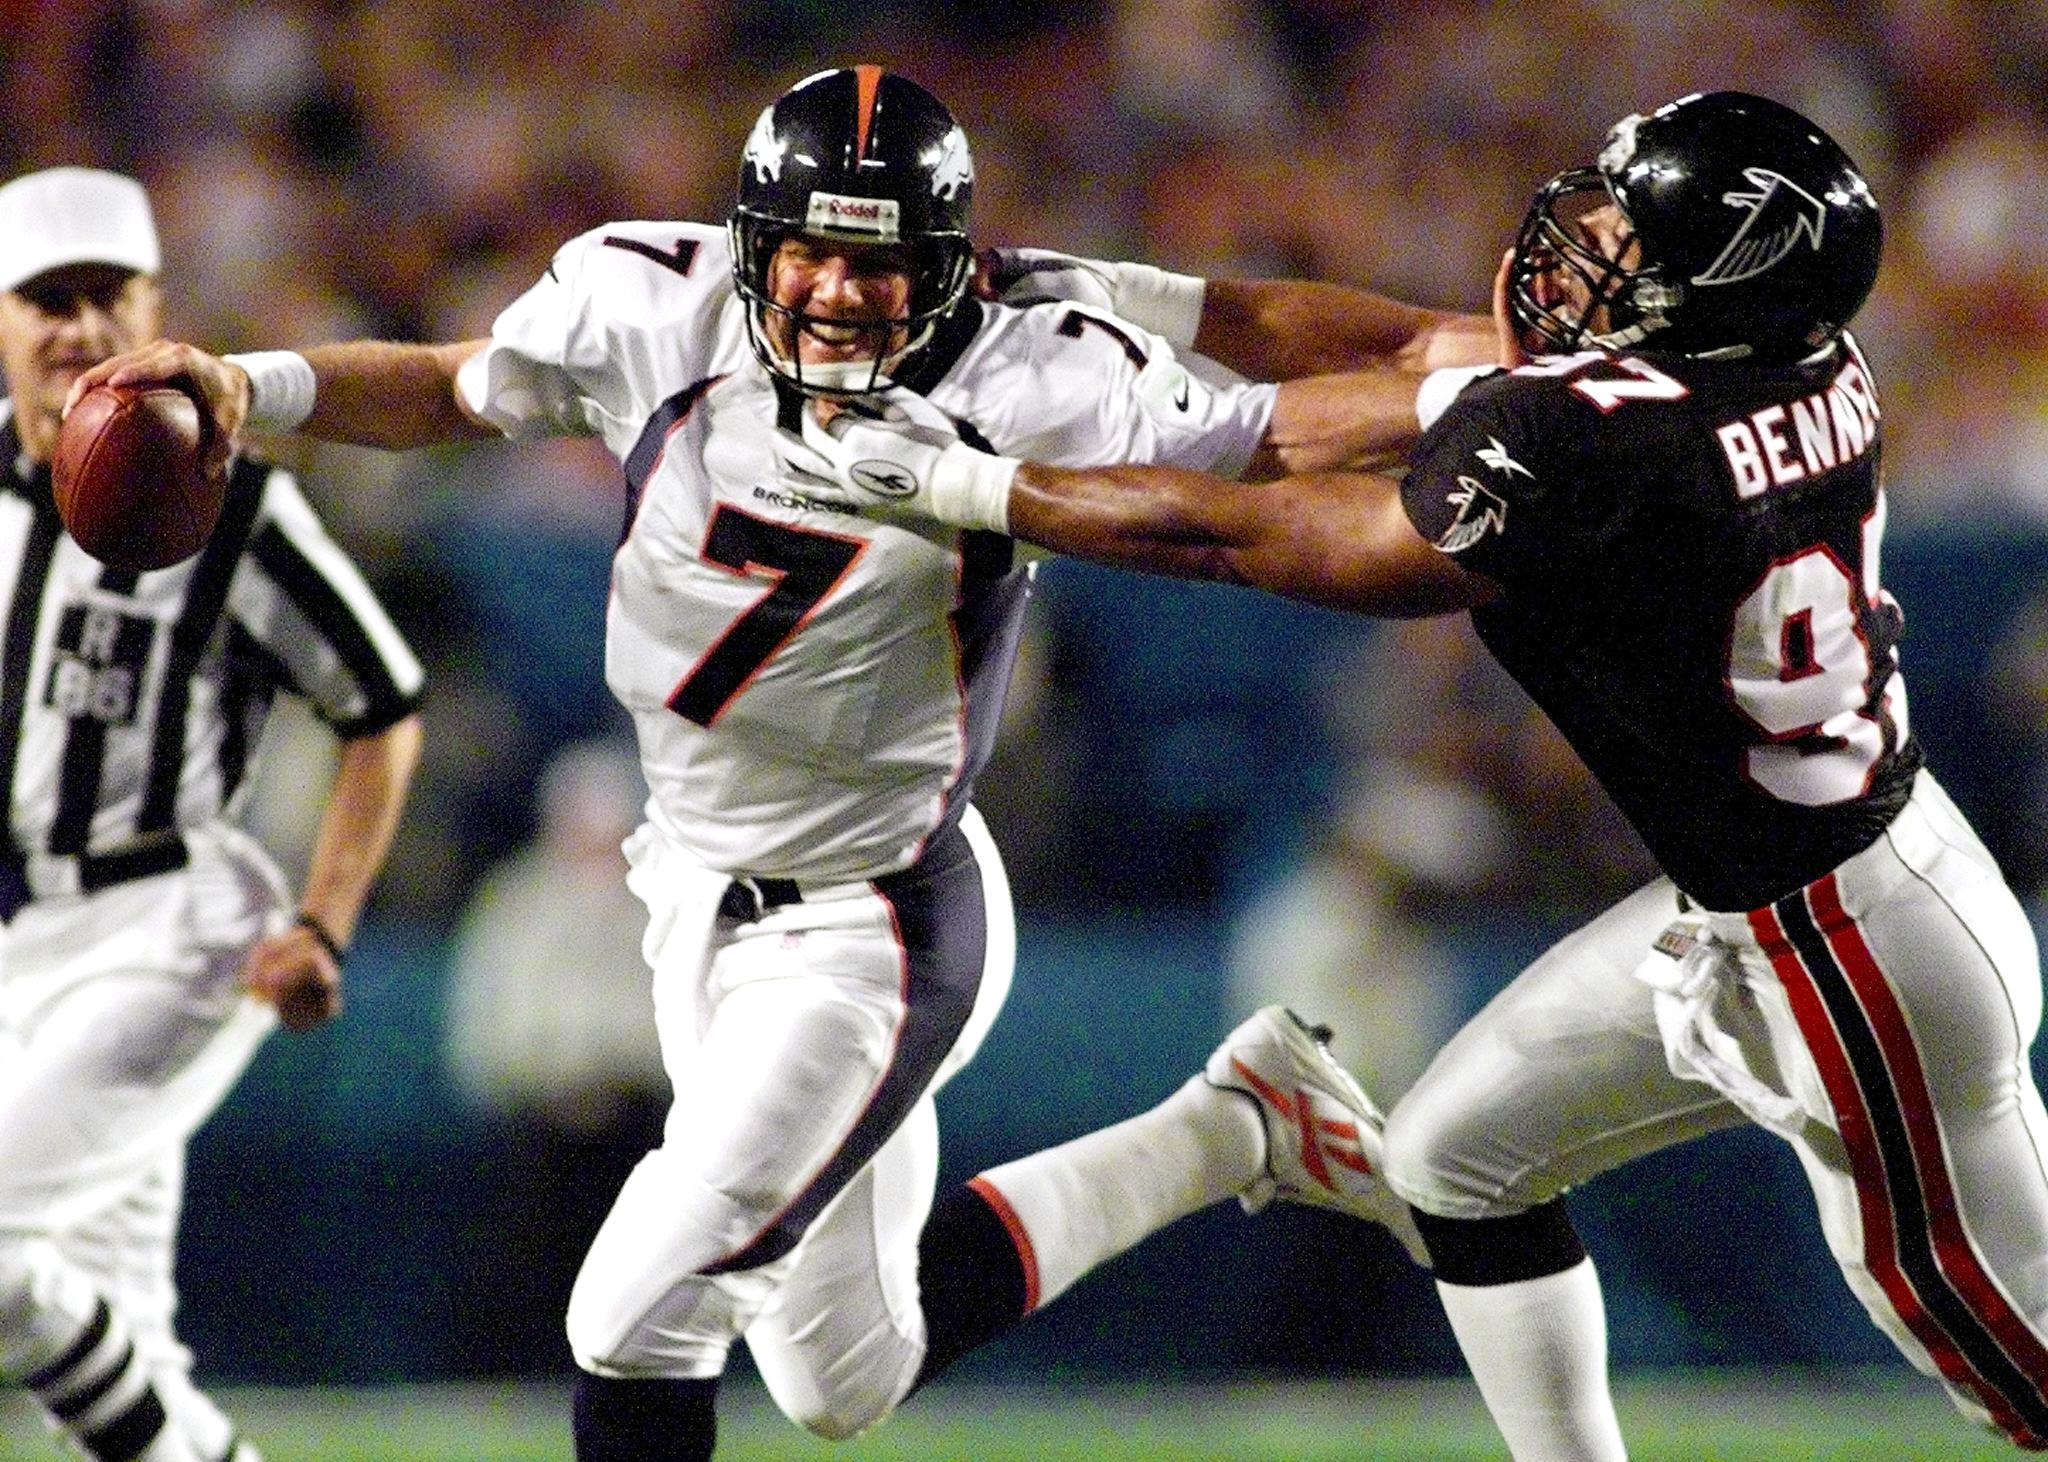 Broncos QB John Elway